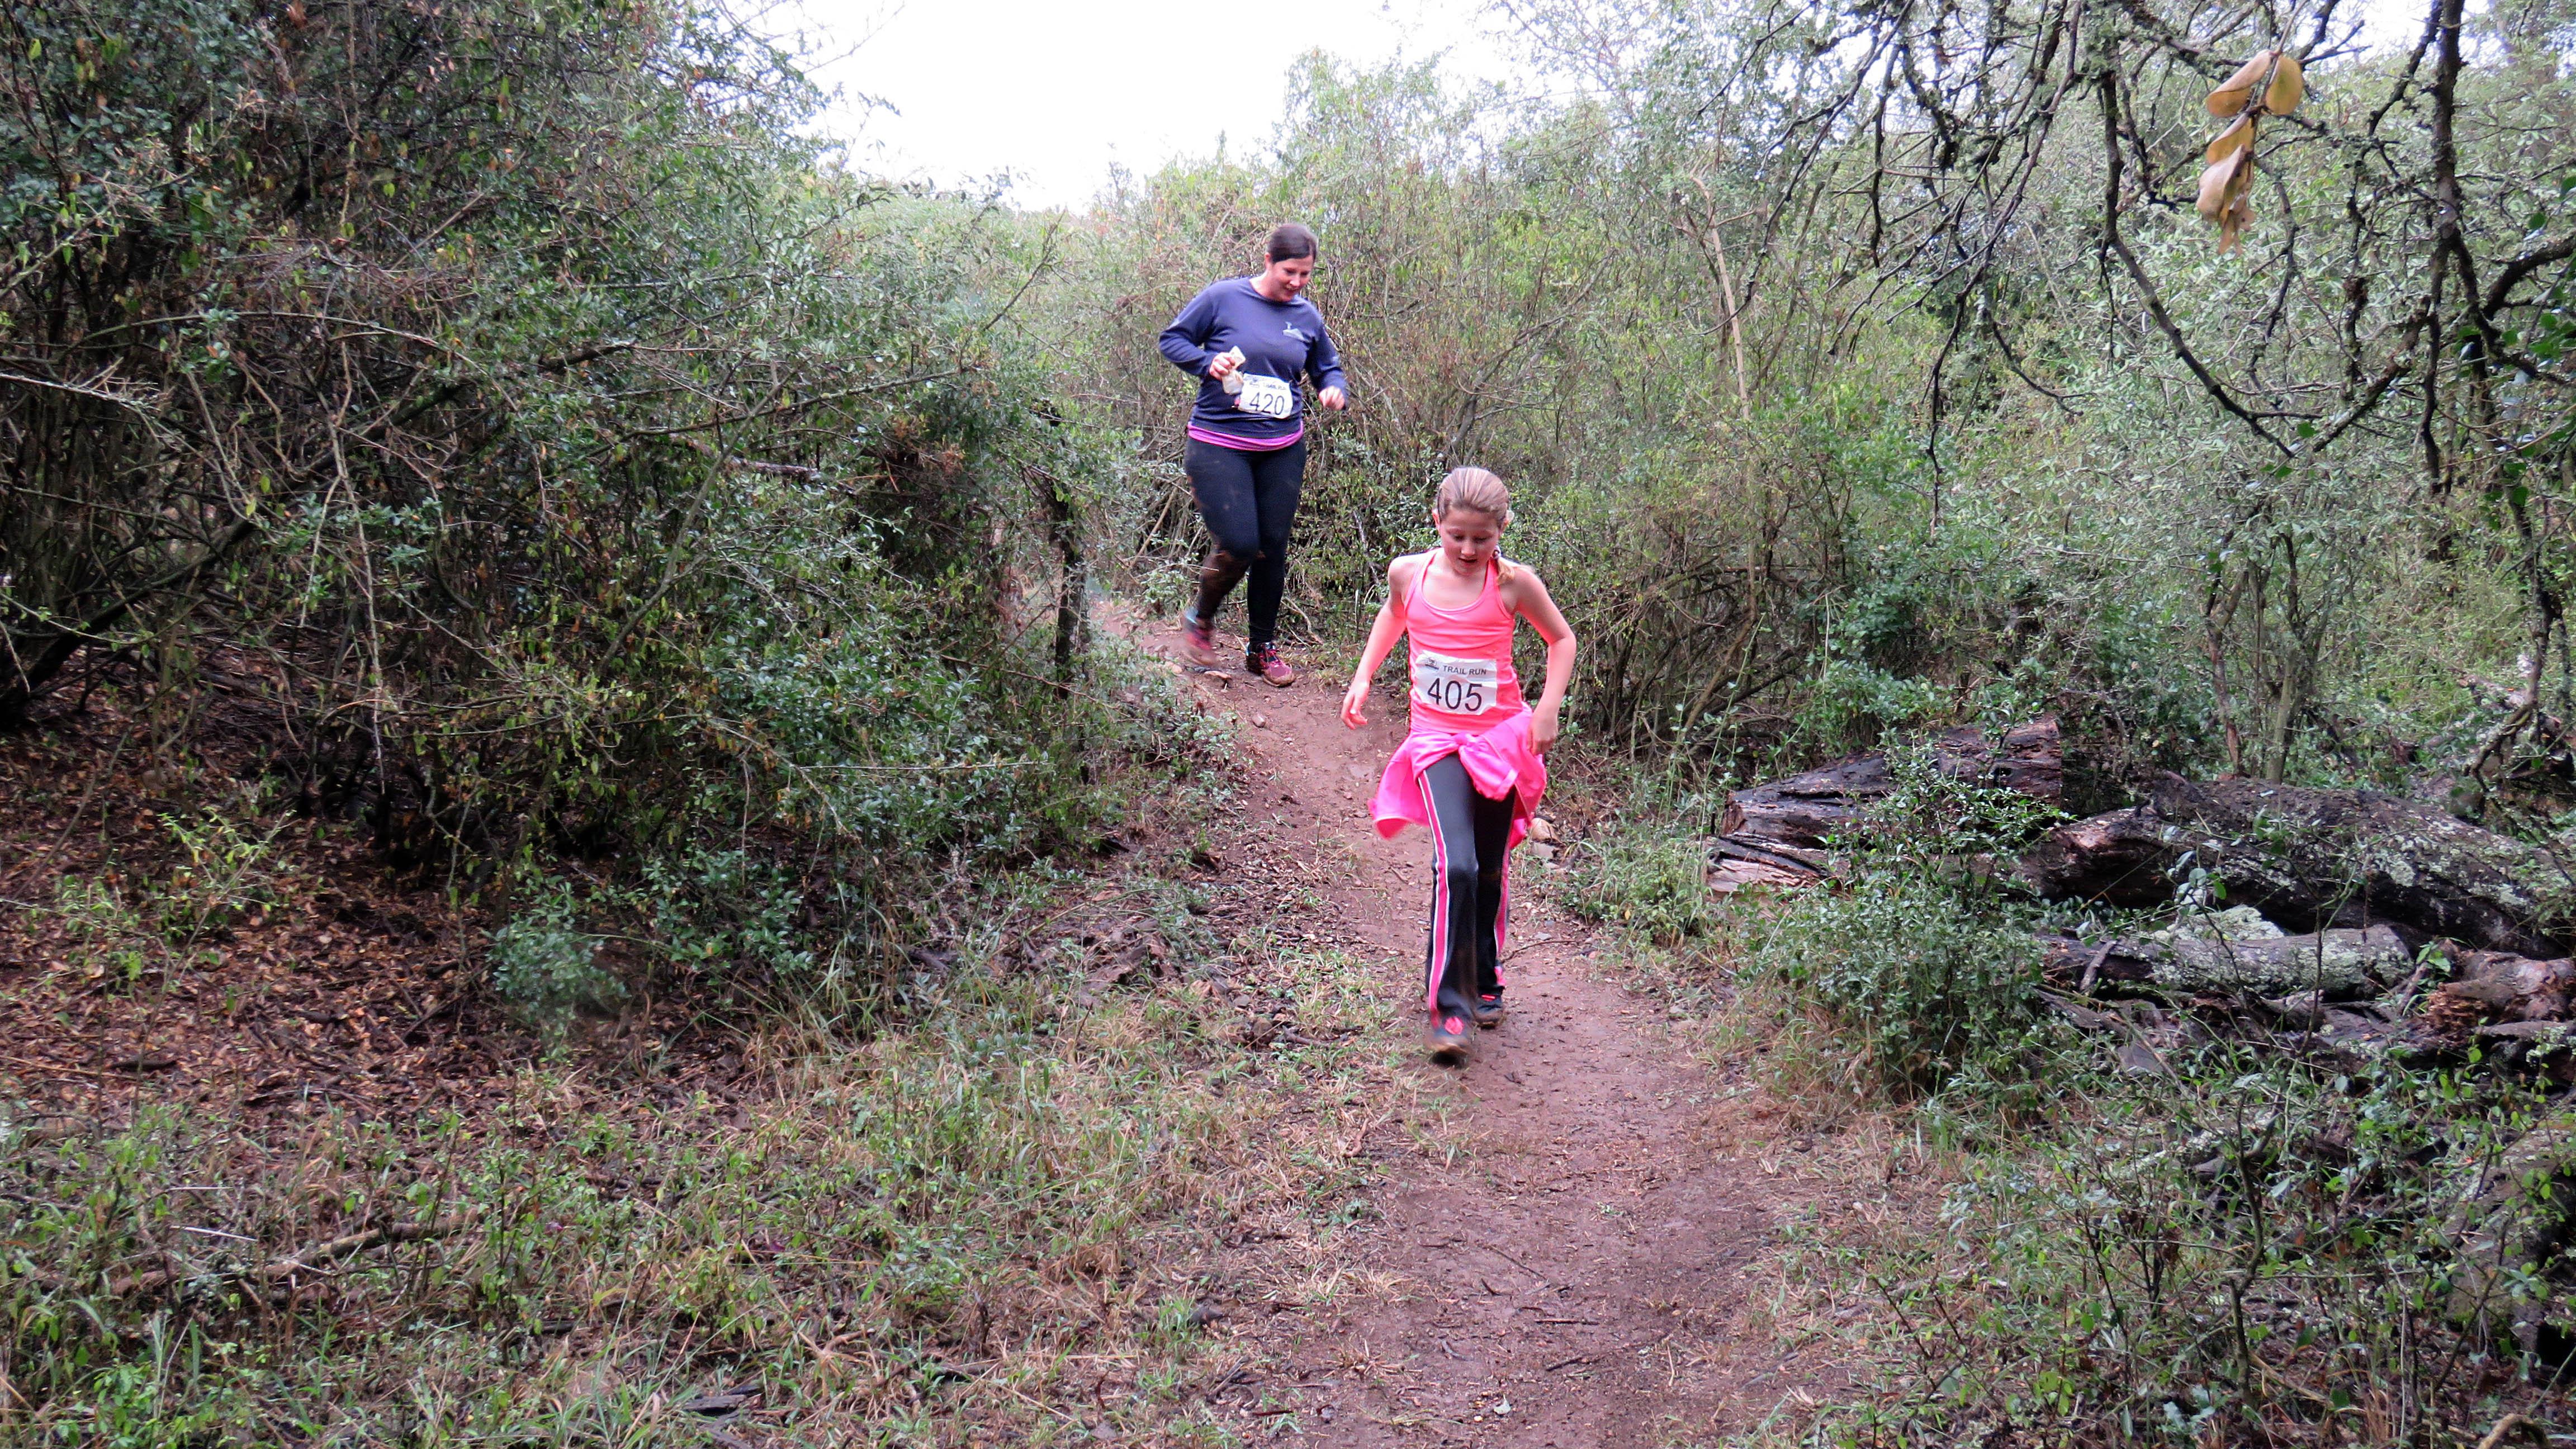 hayterdale trailrun 2018-08-05  (41)